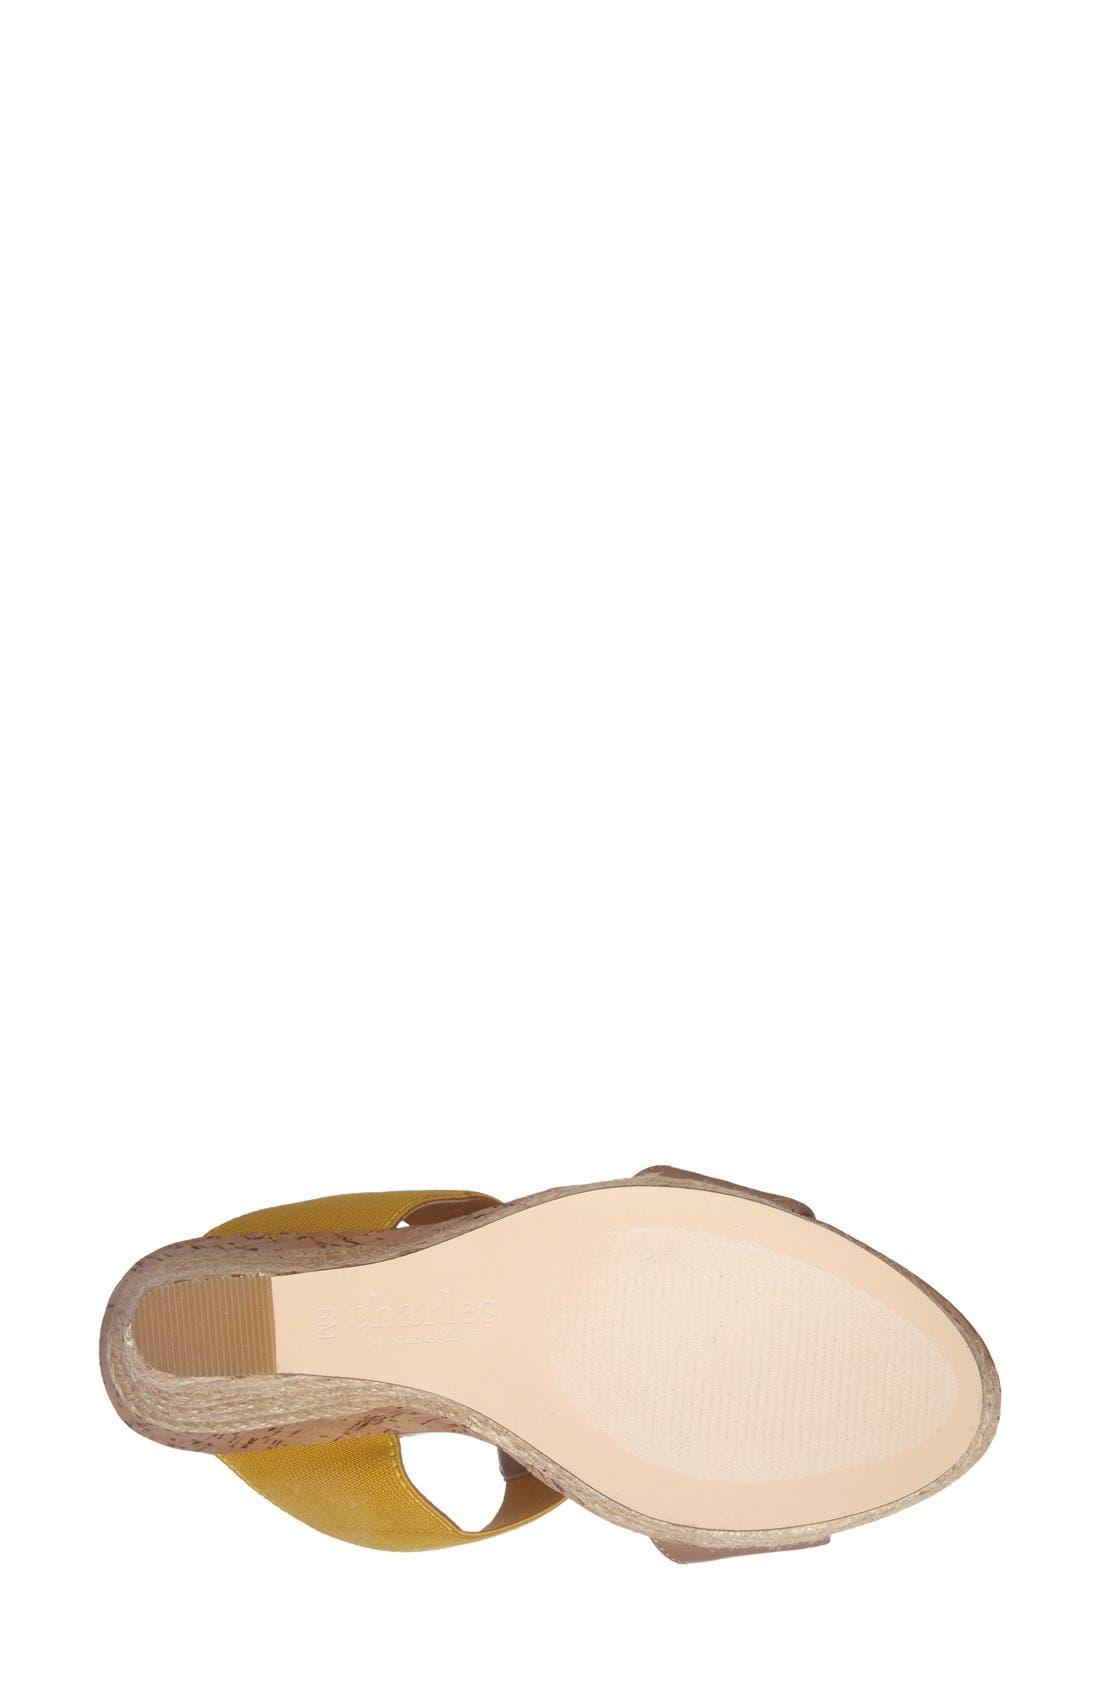 Alternate Image 4  - Charles by Charles David 'Alto' Espadrille Wedge Sandal (Women)